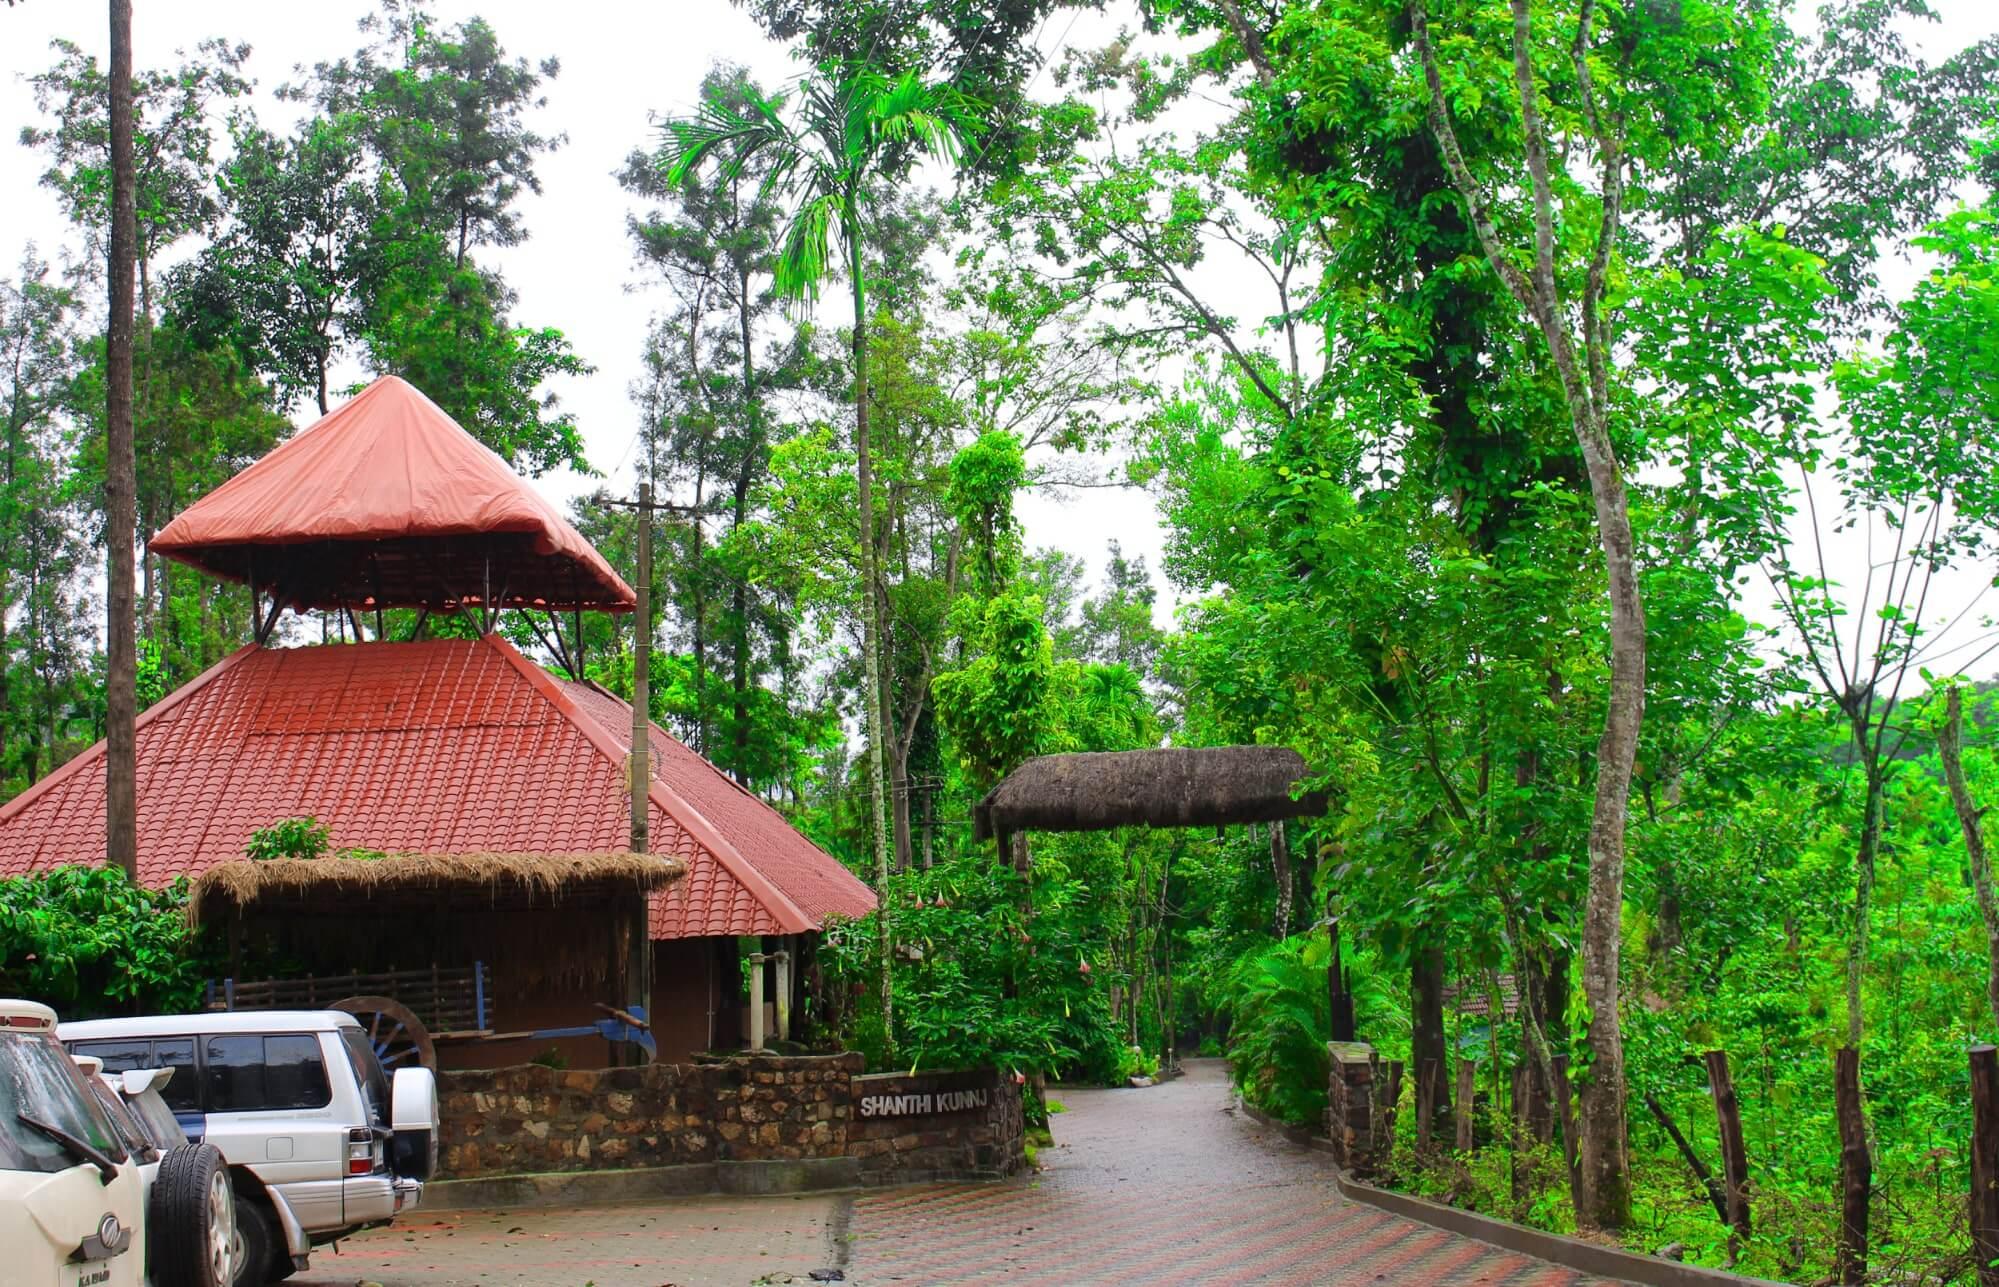 Shanthi Kunnj Homestay